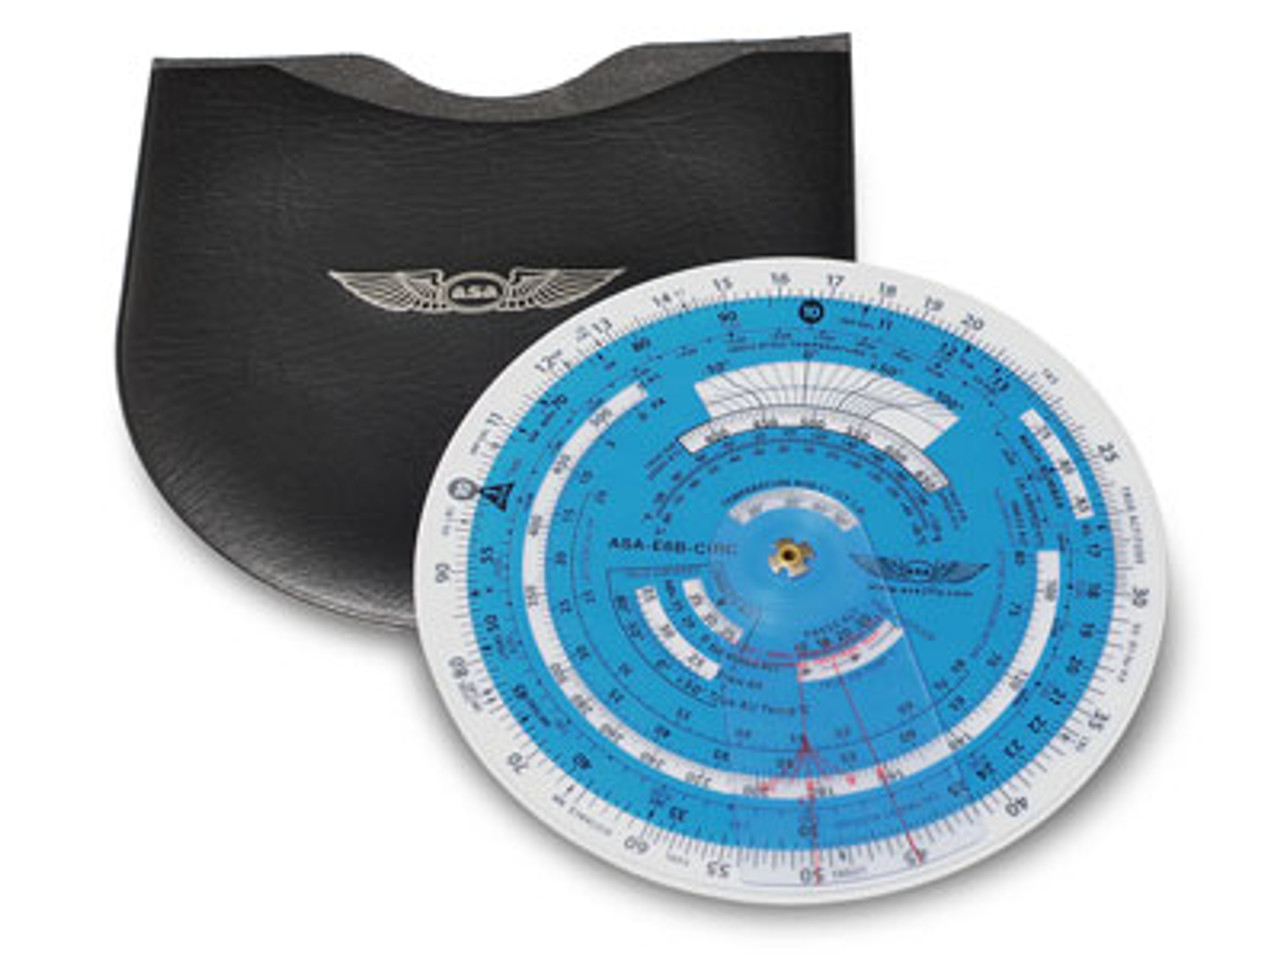 ASA E6-B Circular Flight Computer